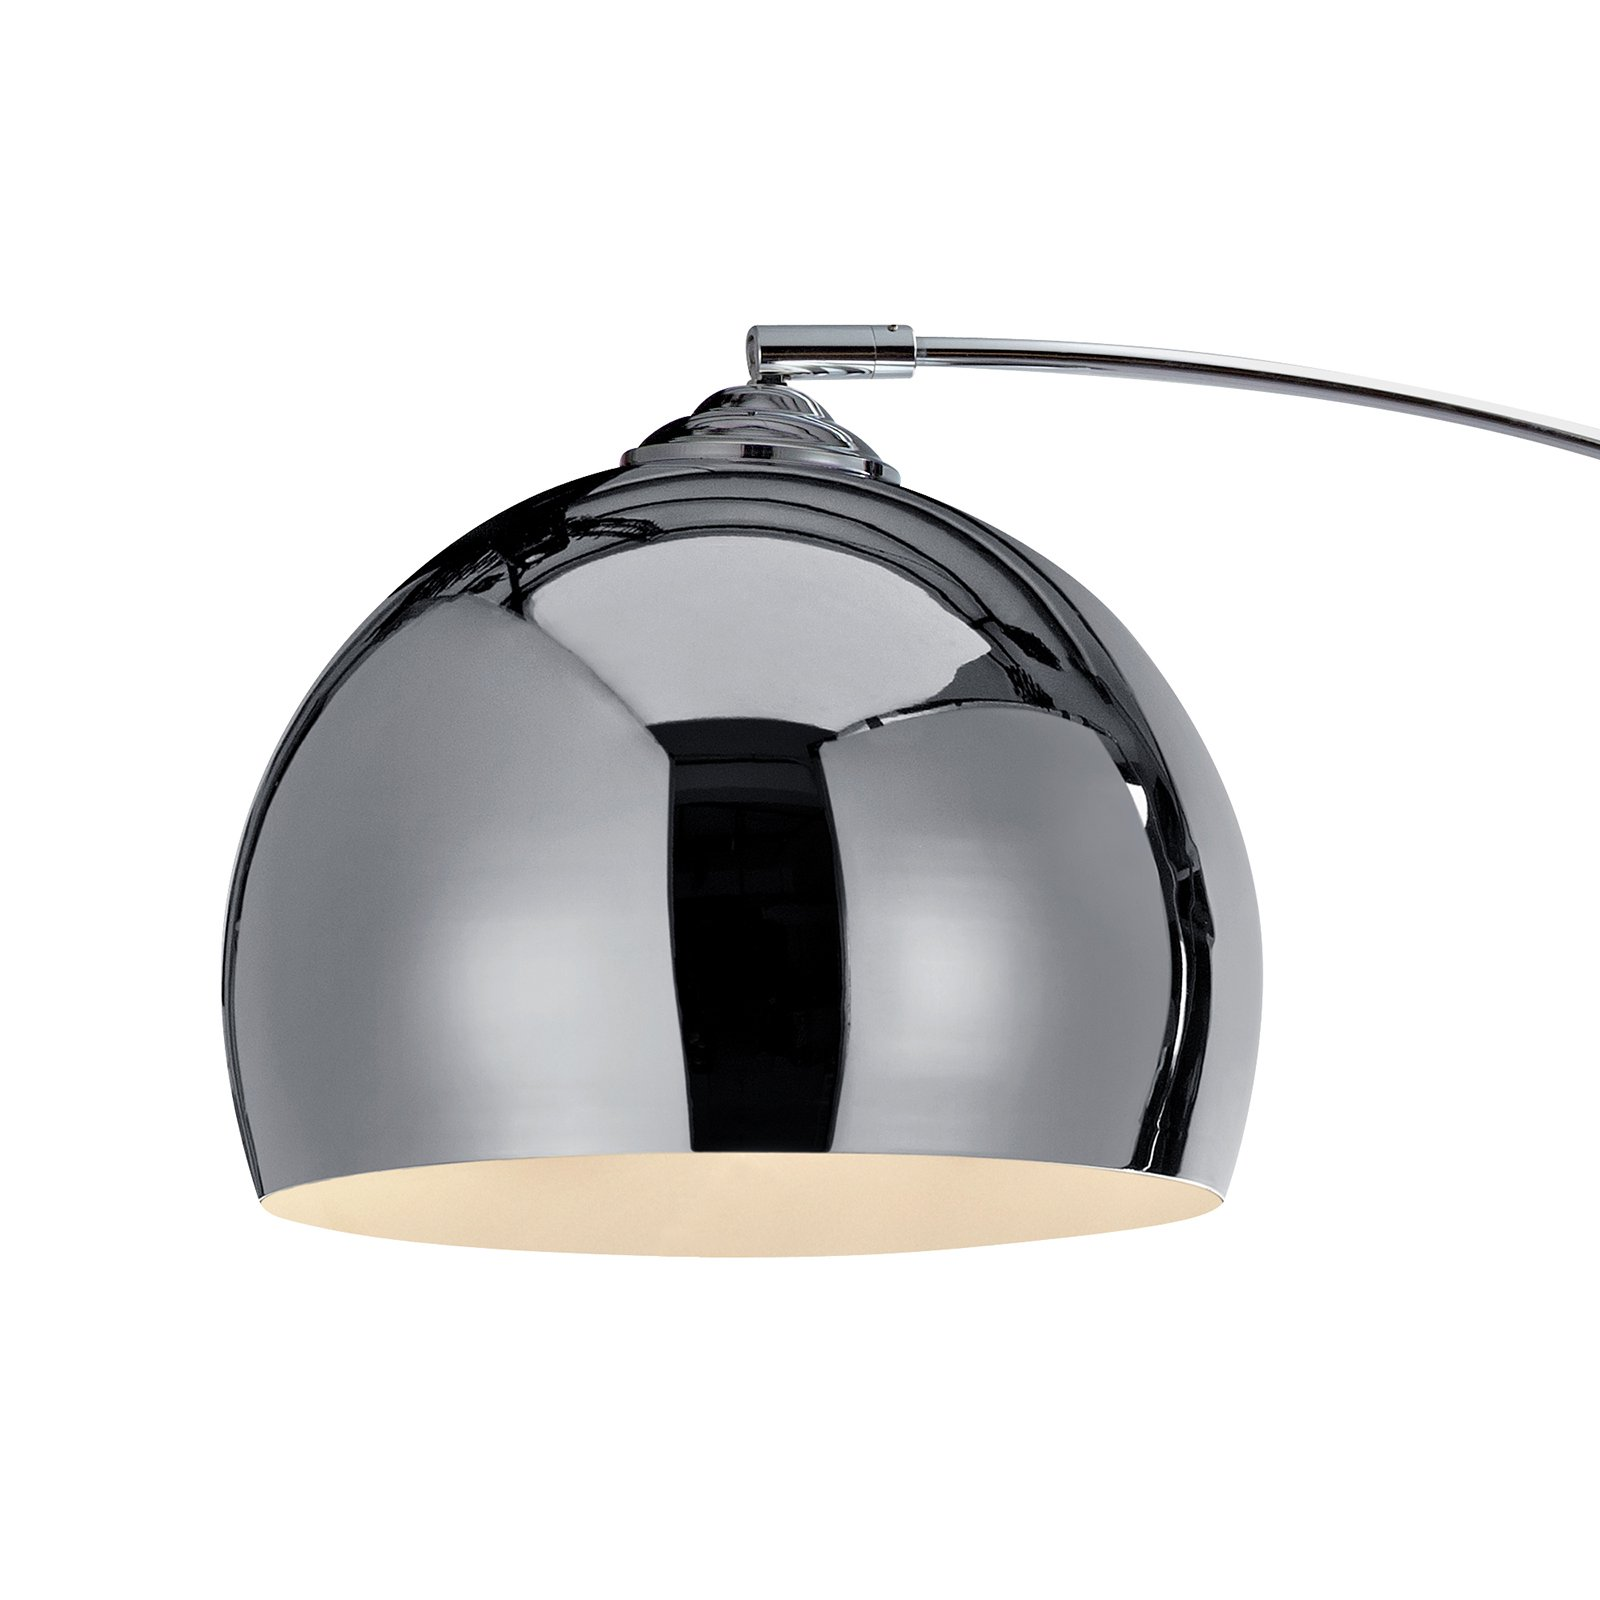 Copper Shade Versanora- Arquer Arc Floor Lamp 67/'H Black Marble Base